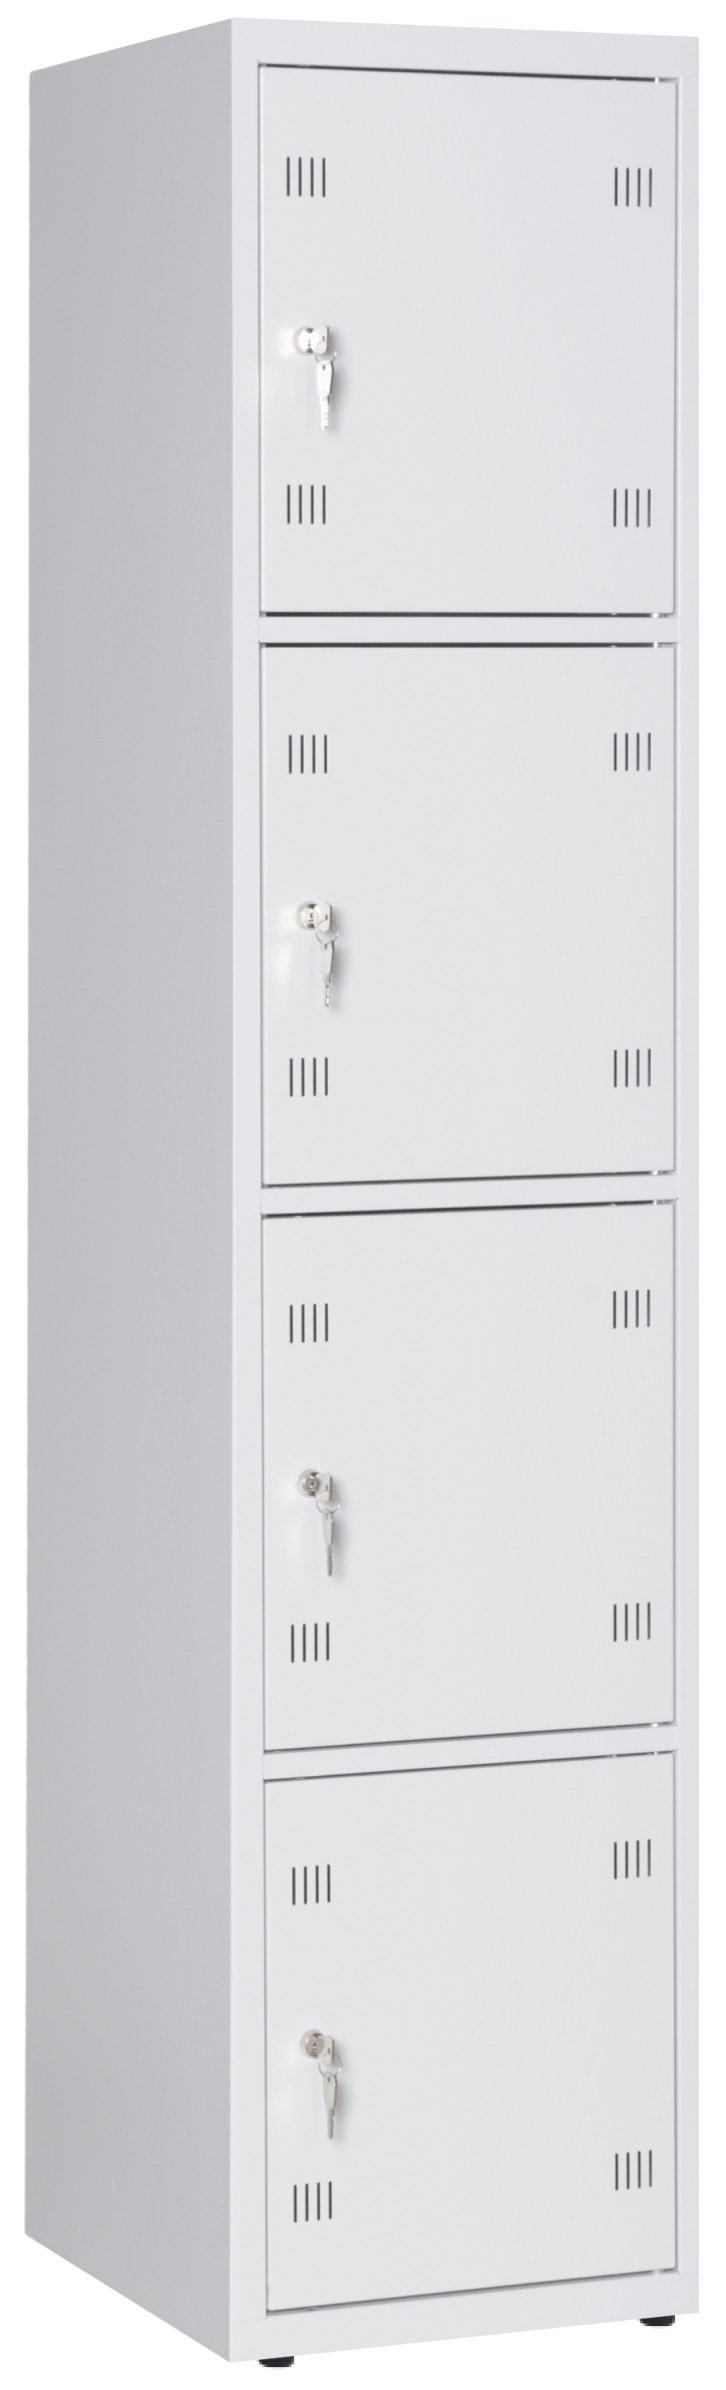 Szafka skrytkowa SP400-004